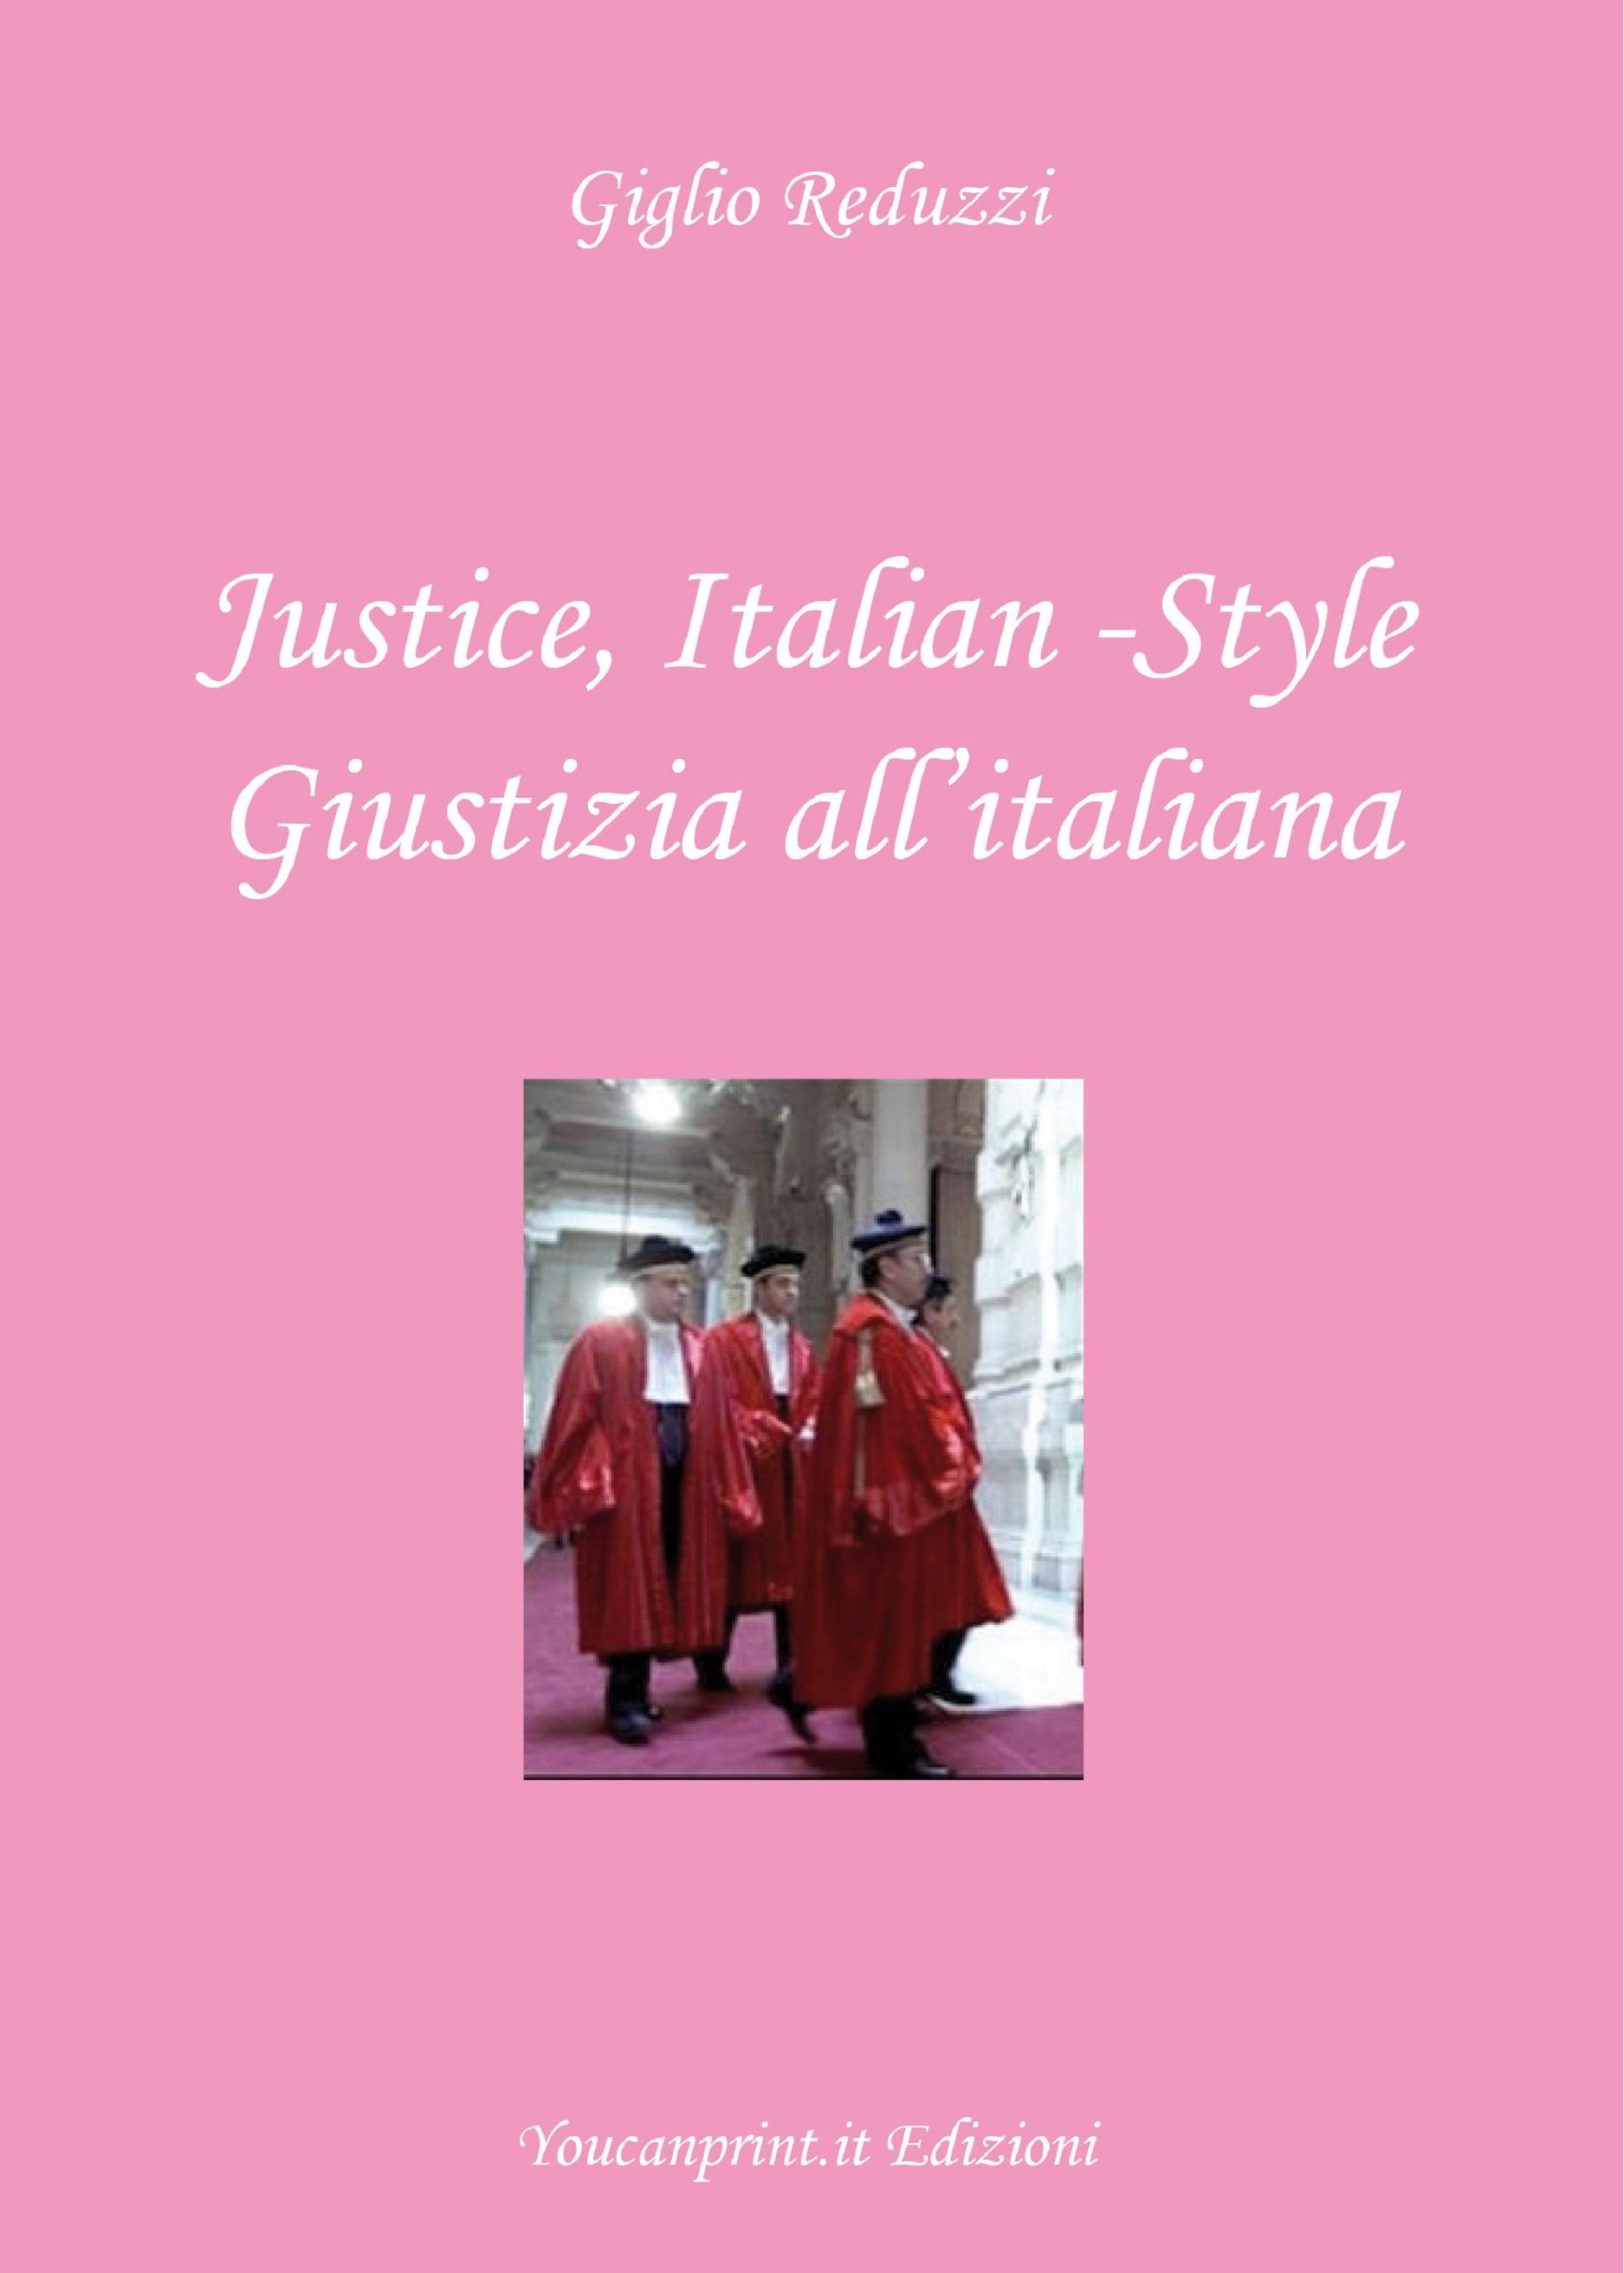 Justice, Italian-Style - Giustizia all'italiana